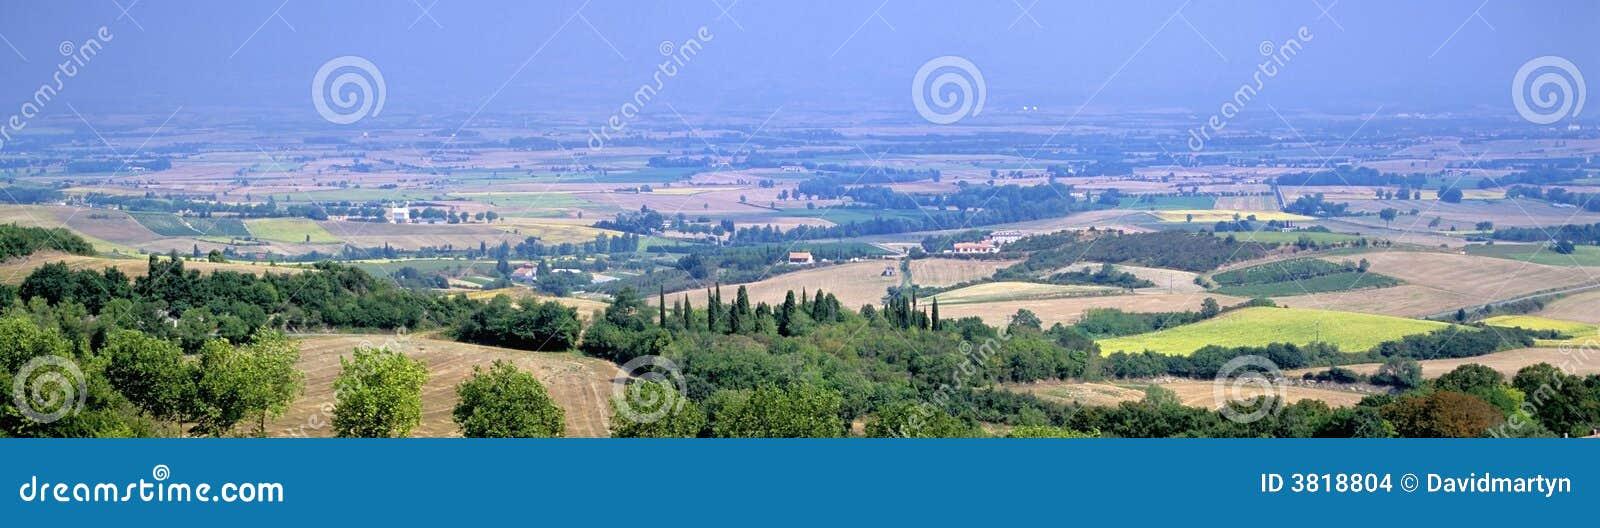 ландшафт languedoc